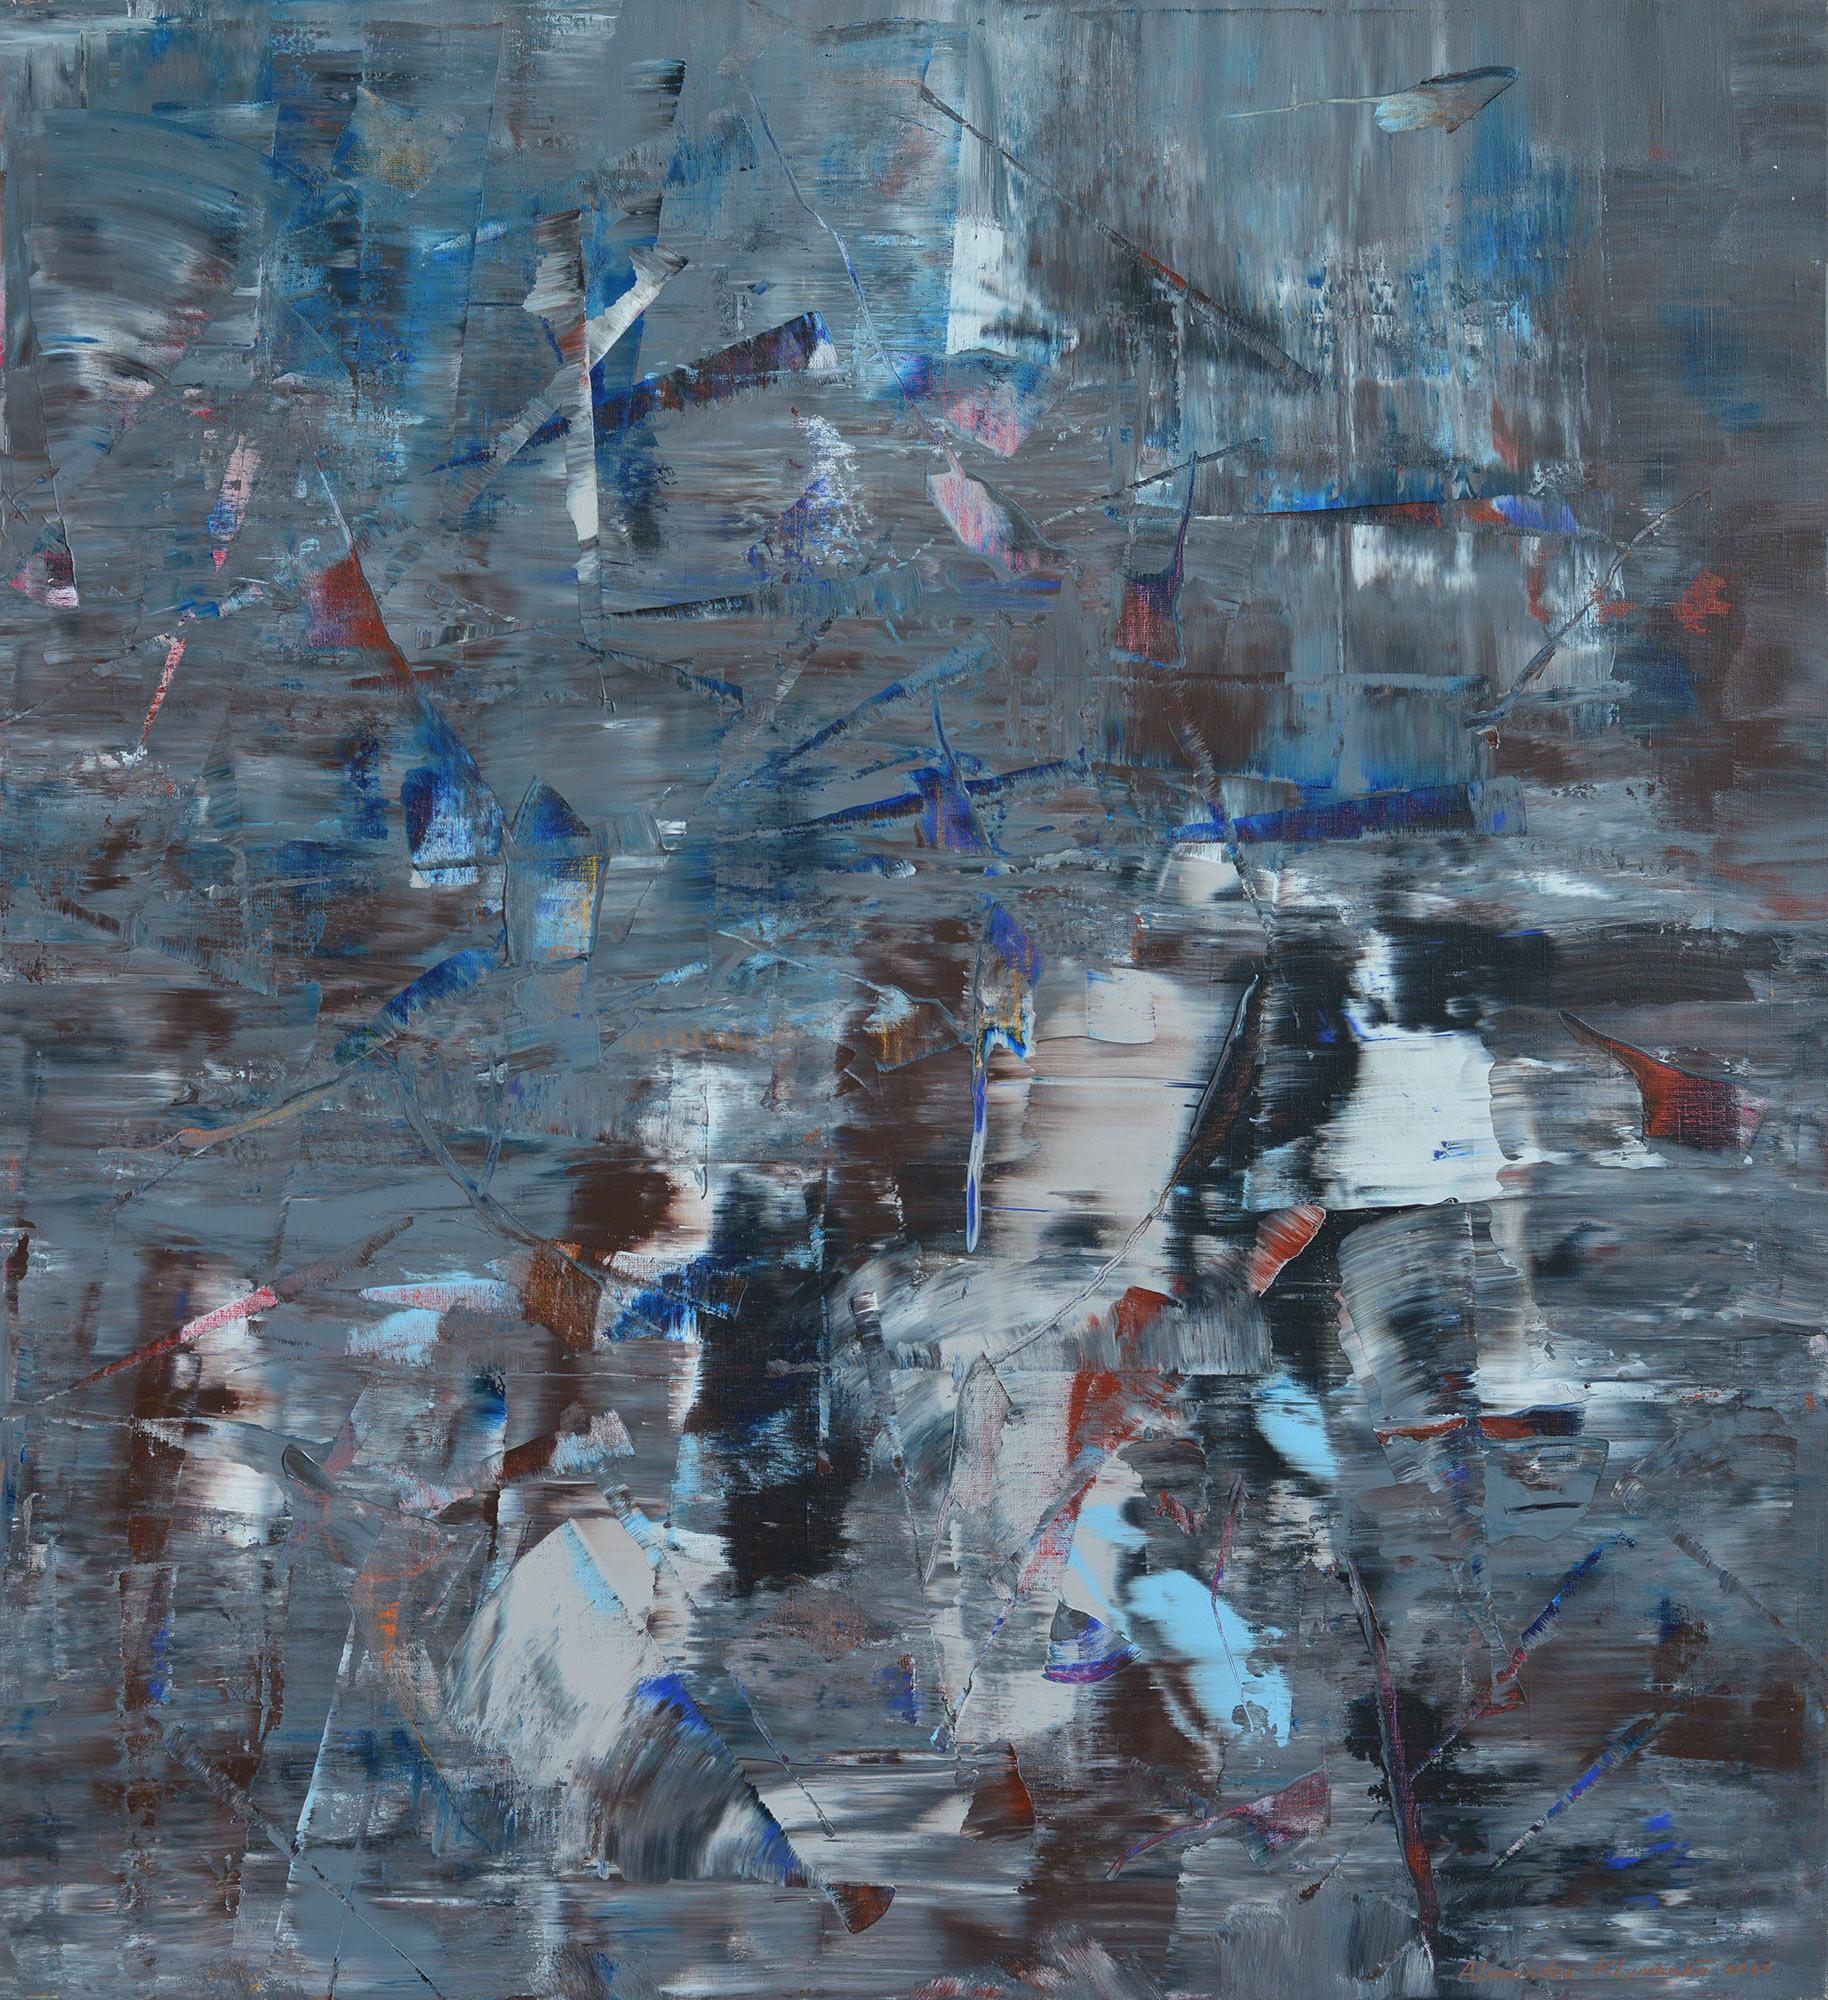 LONDON, TWILIGHT, RAIN, CITY LIGHTS AND CARS BEHIND THE GLASS CAFE, 2017 acrylic on canvas, original media; 120 x 110 cm